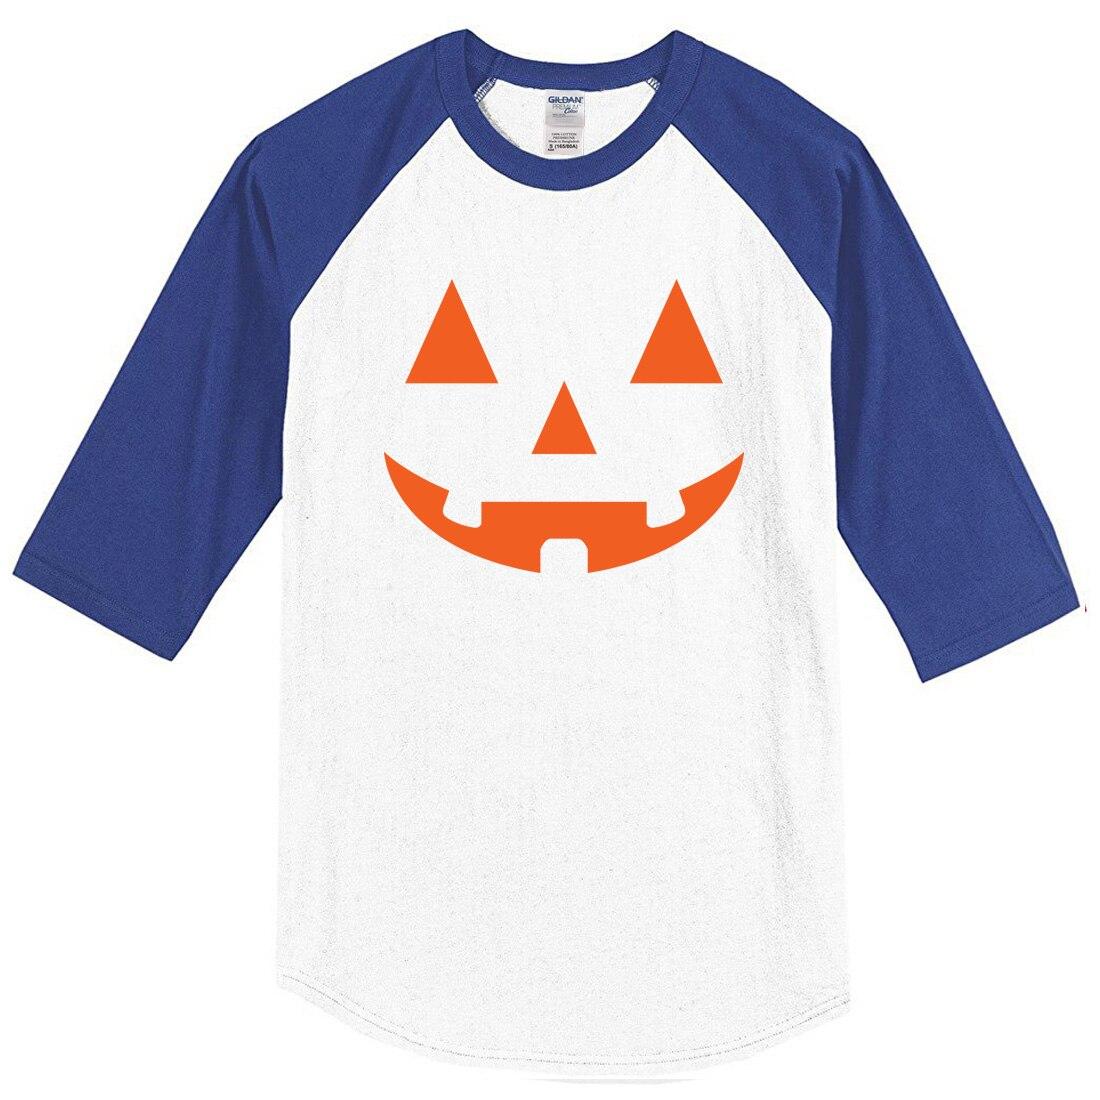 bc02e425a8c 2019 Men s T Shirts summer Joe s USA(tm) JACK O  LANTERN PUMPKIN Halloween  Costume T Shirt fashion raglan t shirt men kpop top-in T-Shirts from Men s  ...